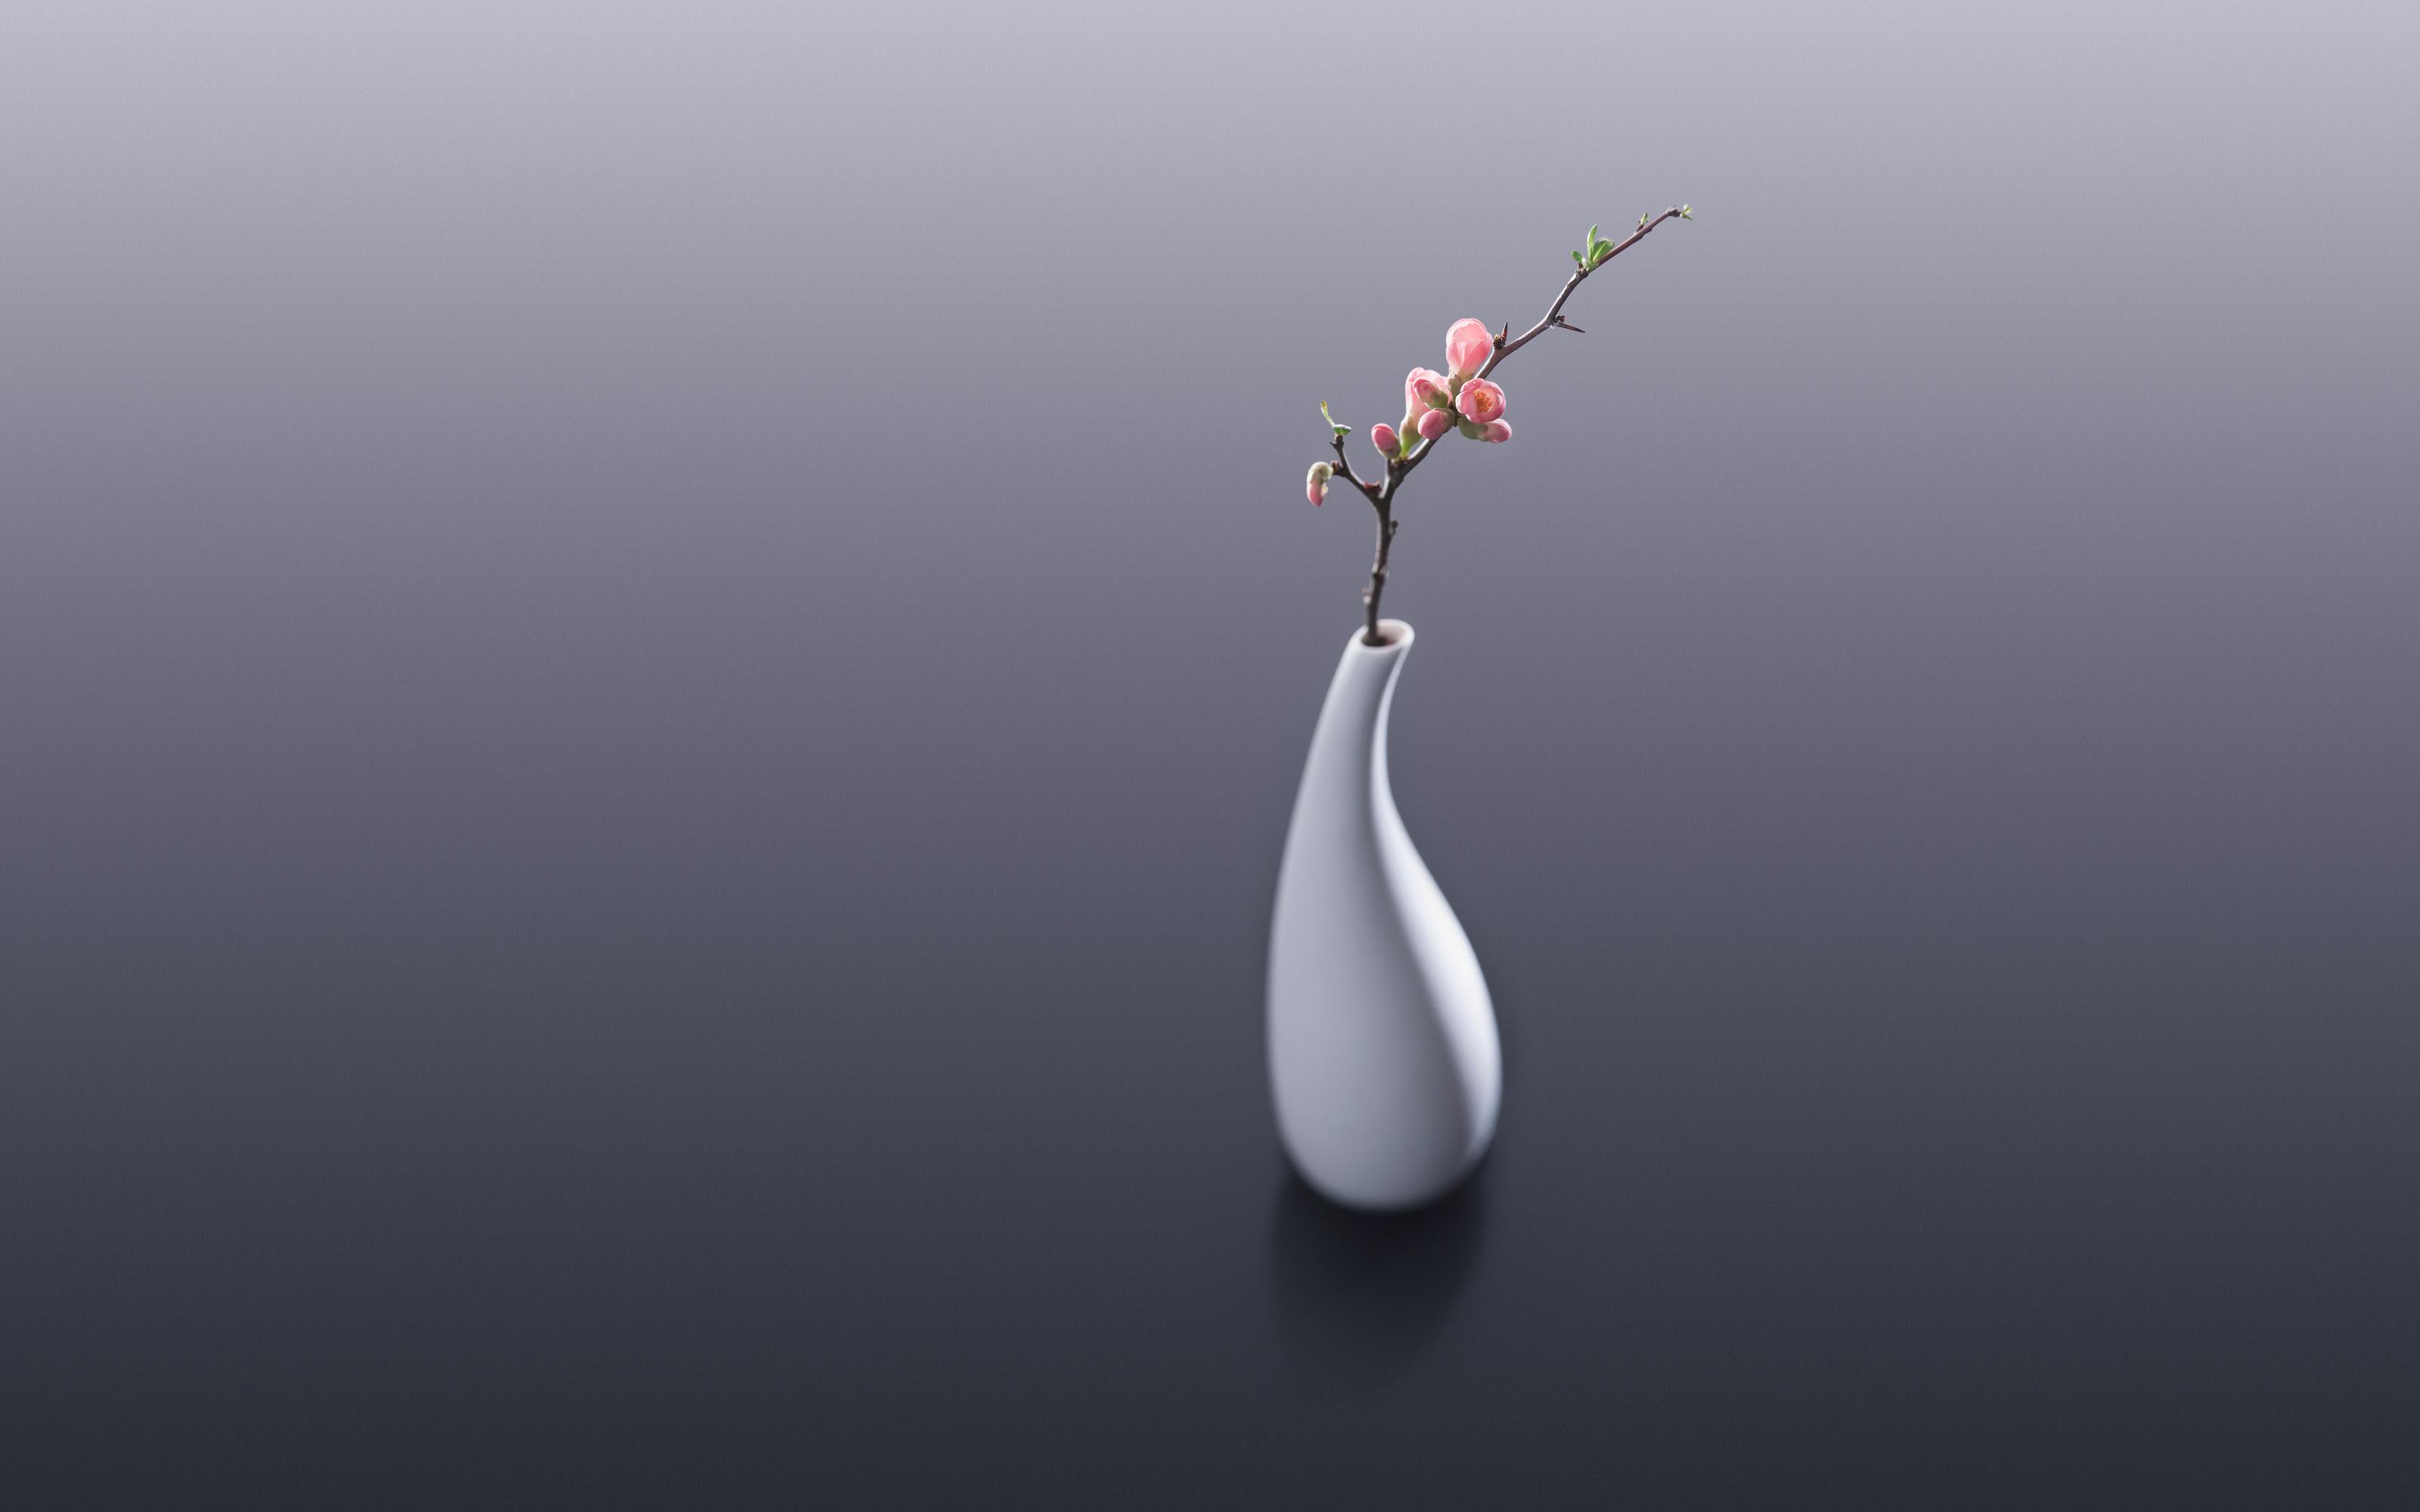 Flower Vase Wallpapers Hd Wallpapers